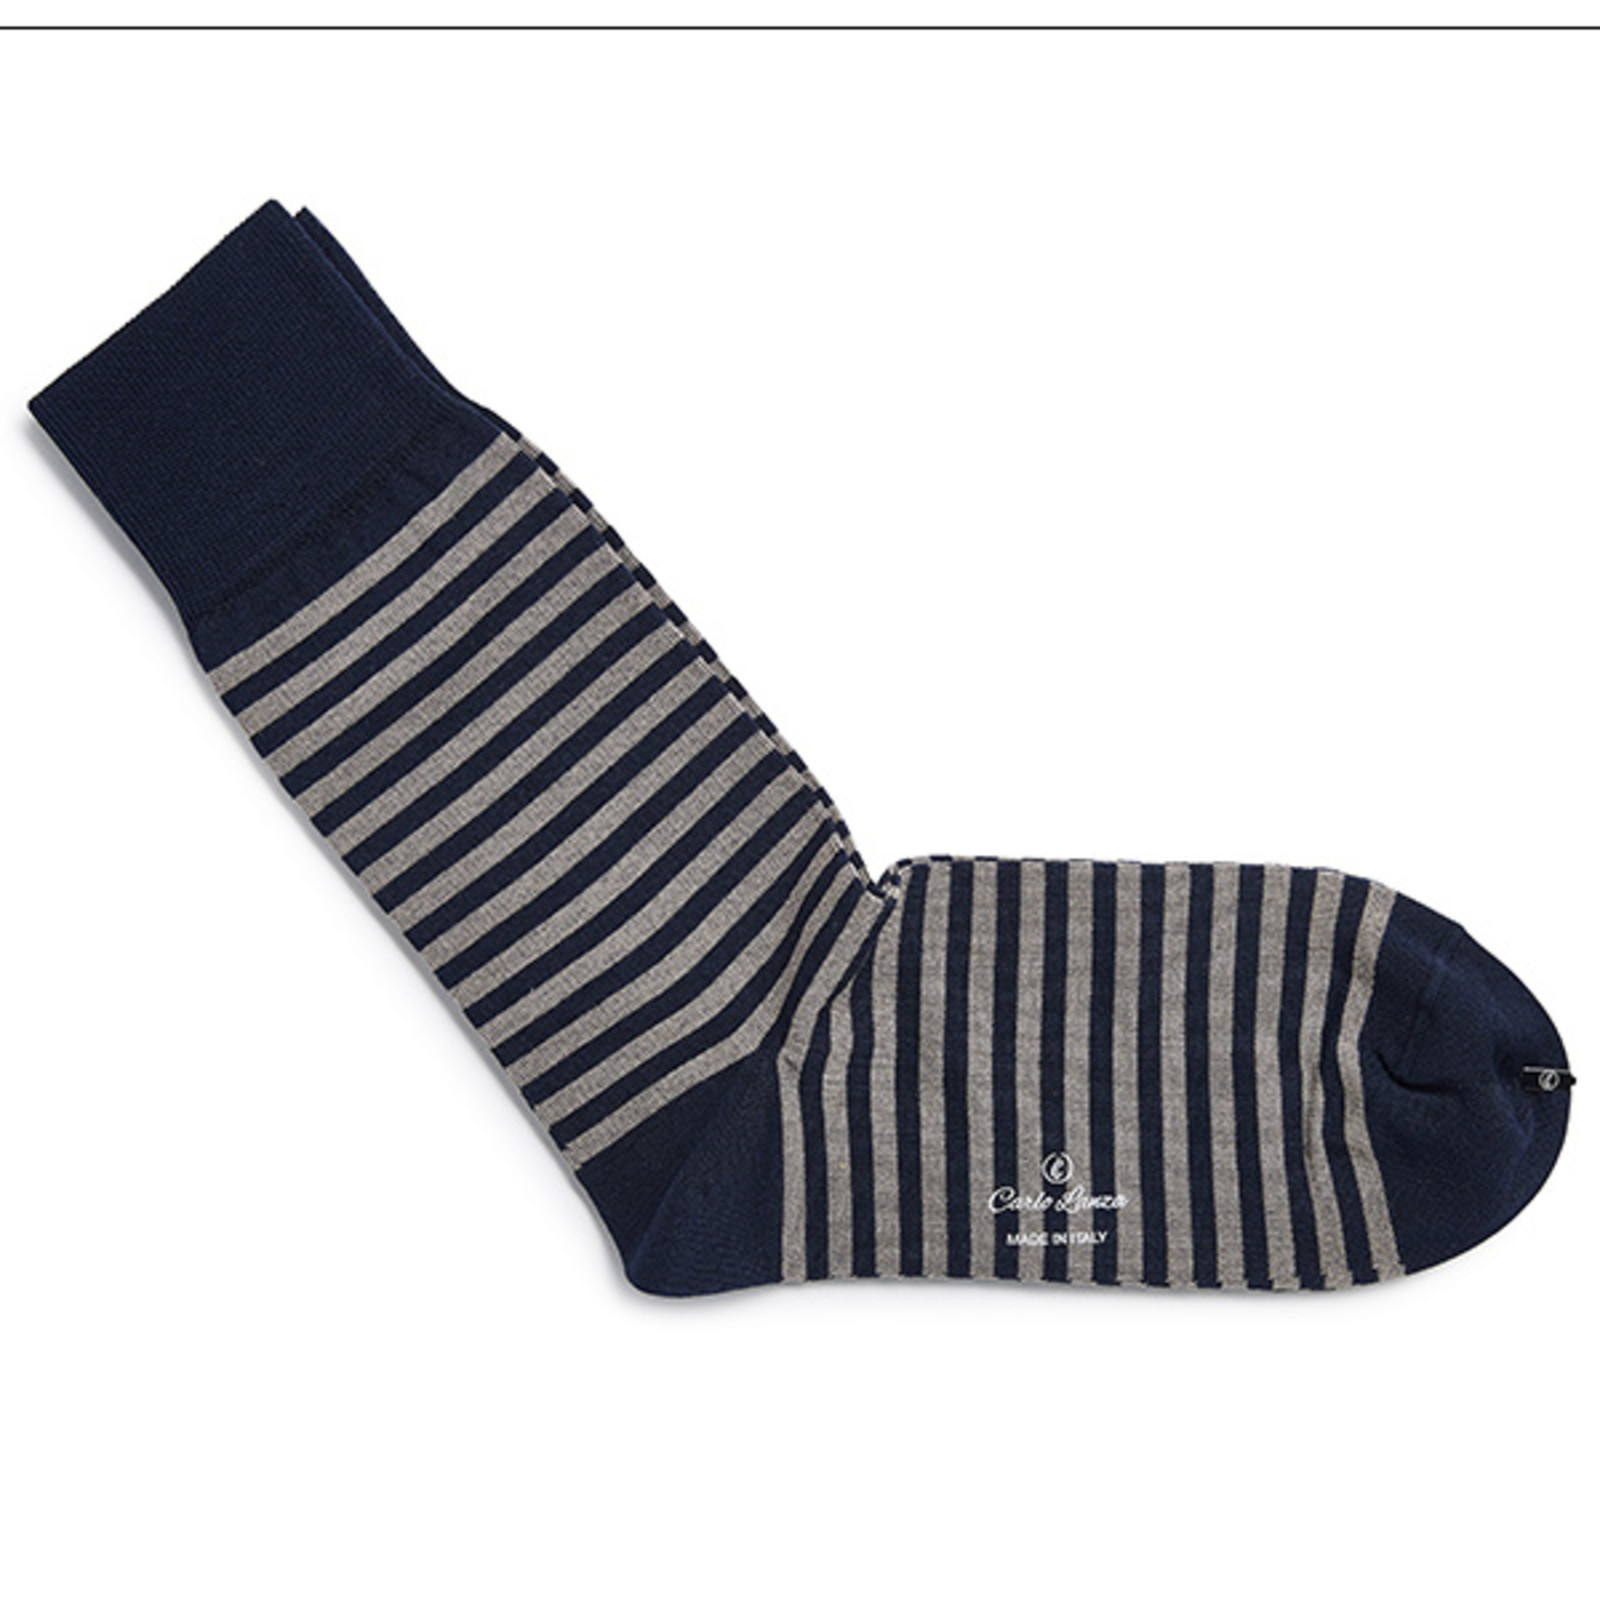 Carlo Lanza Darkblue stripe socks